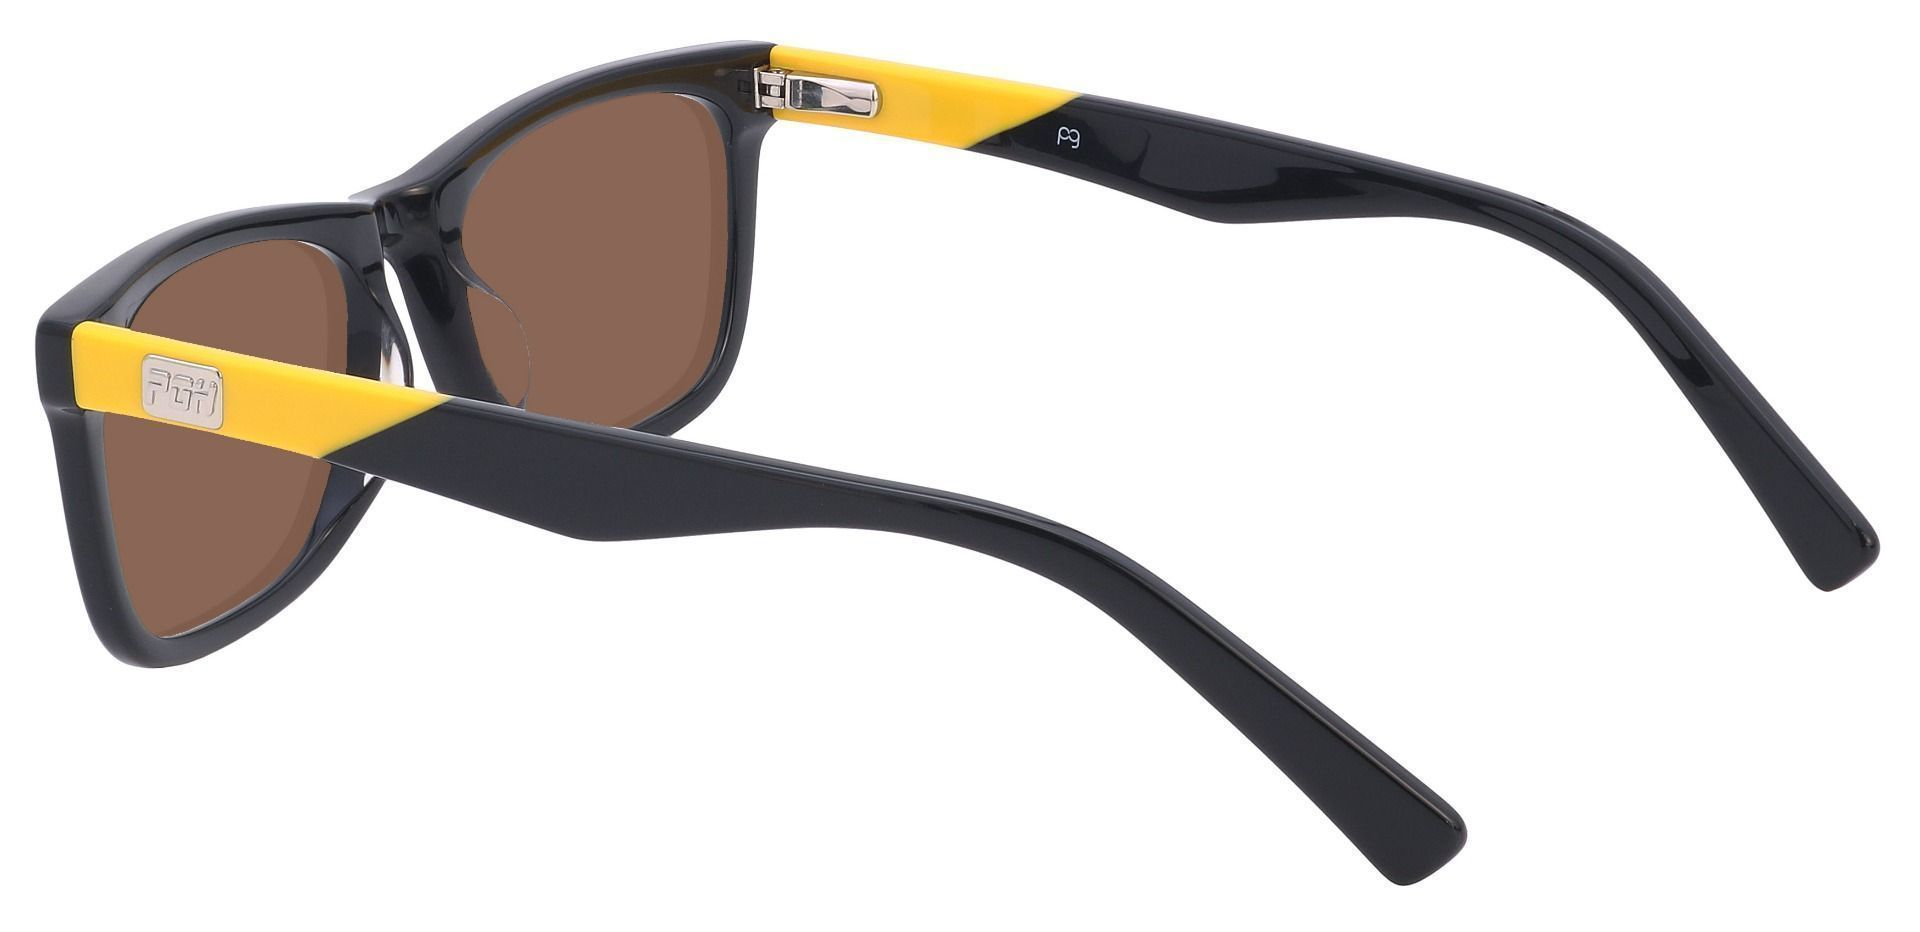 Blitz Rectangle Single Vision Sunglasses - Black Frame With Brown Lenses